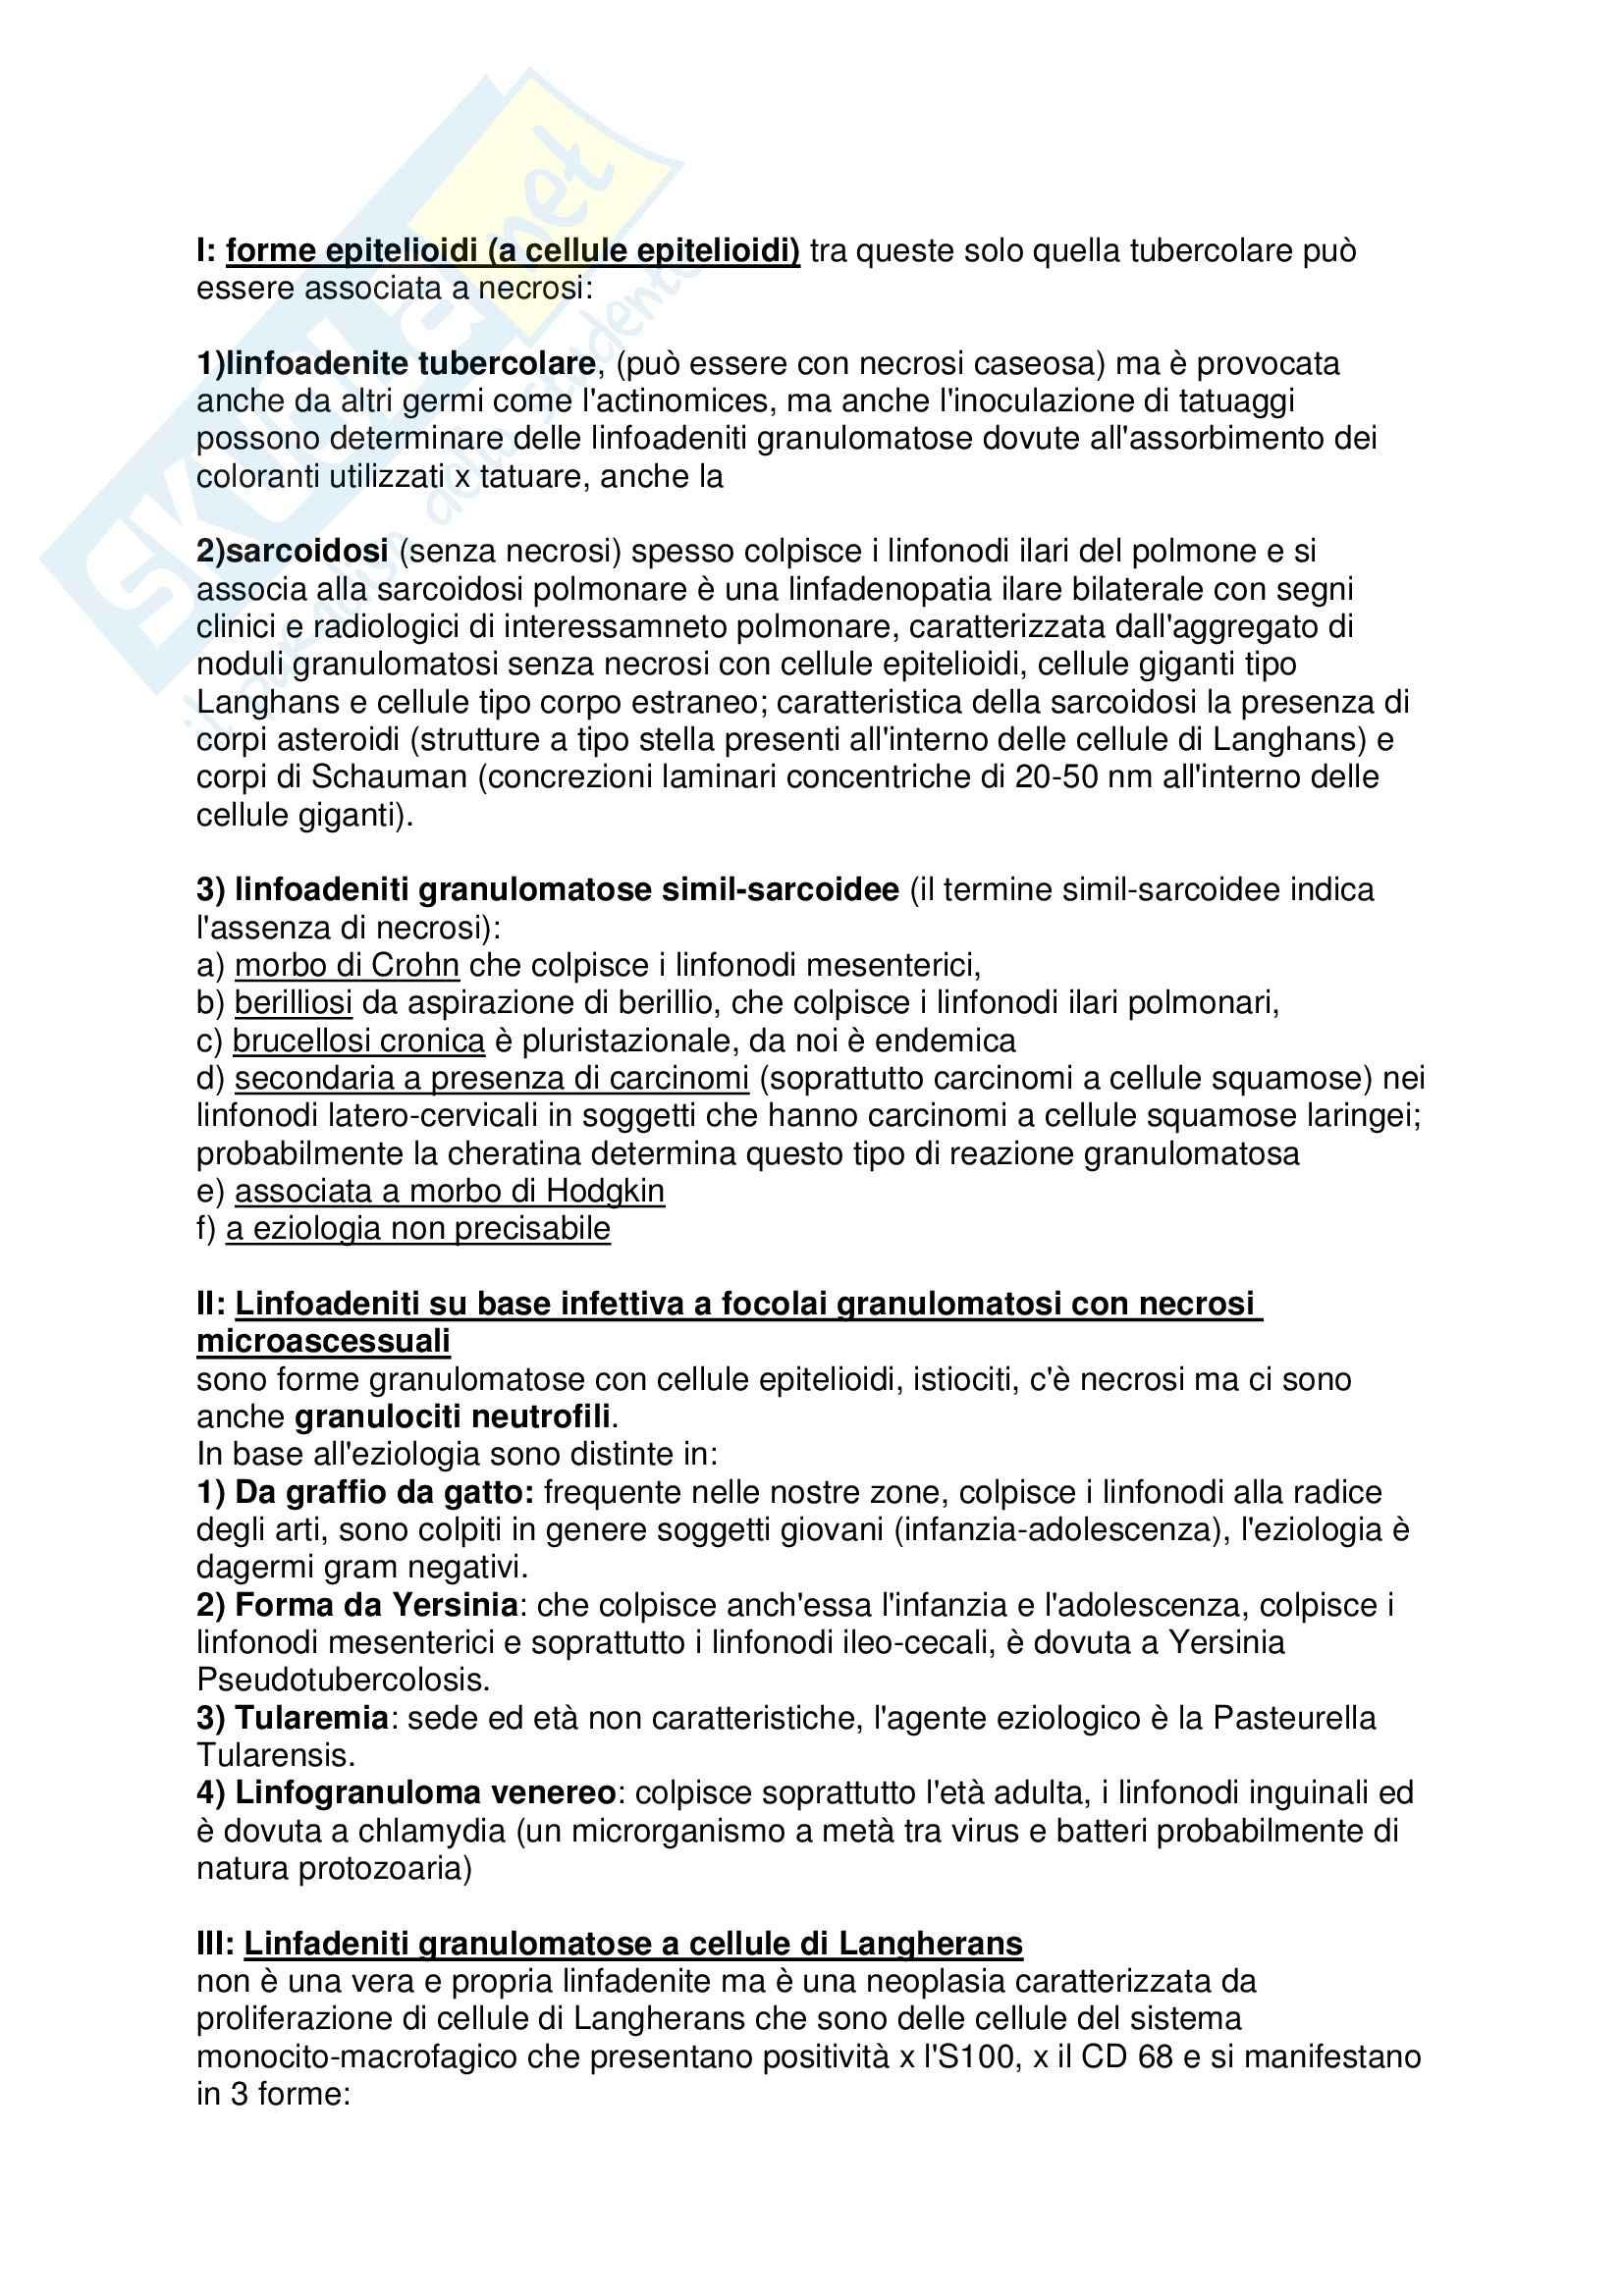 Anatomia patologica - iperplasia Pag. 6